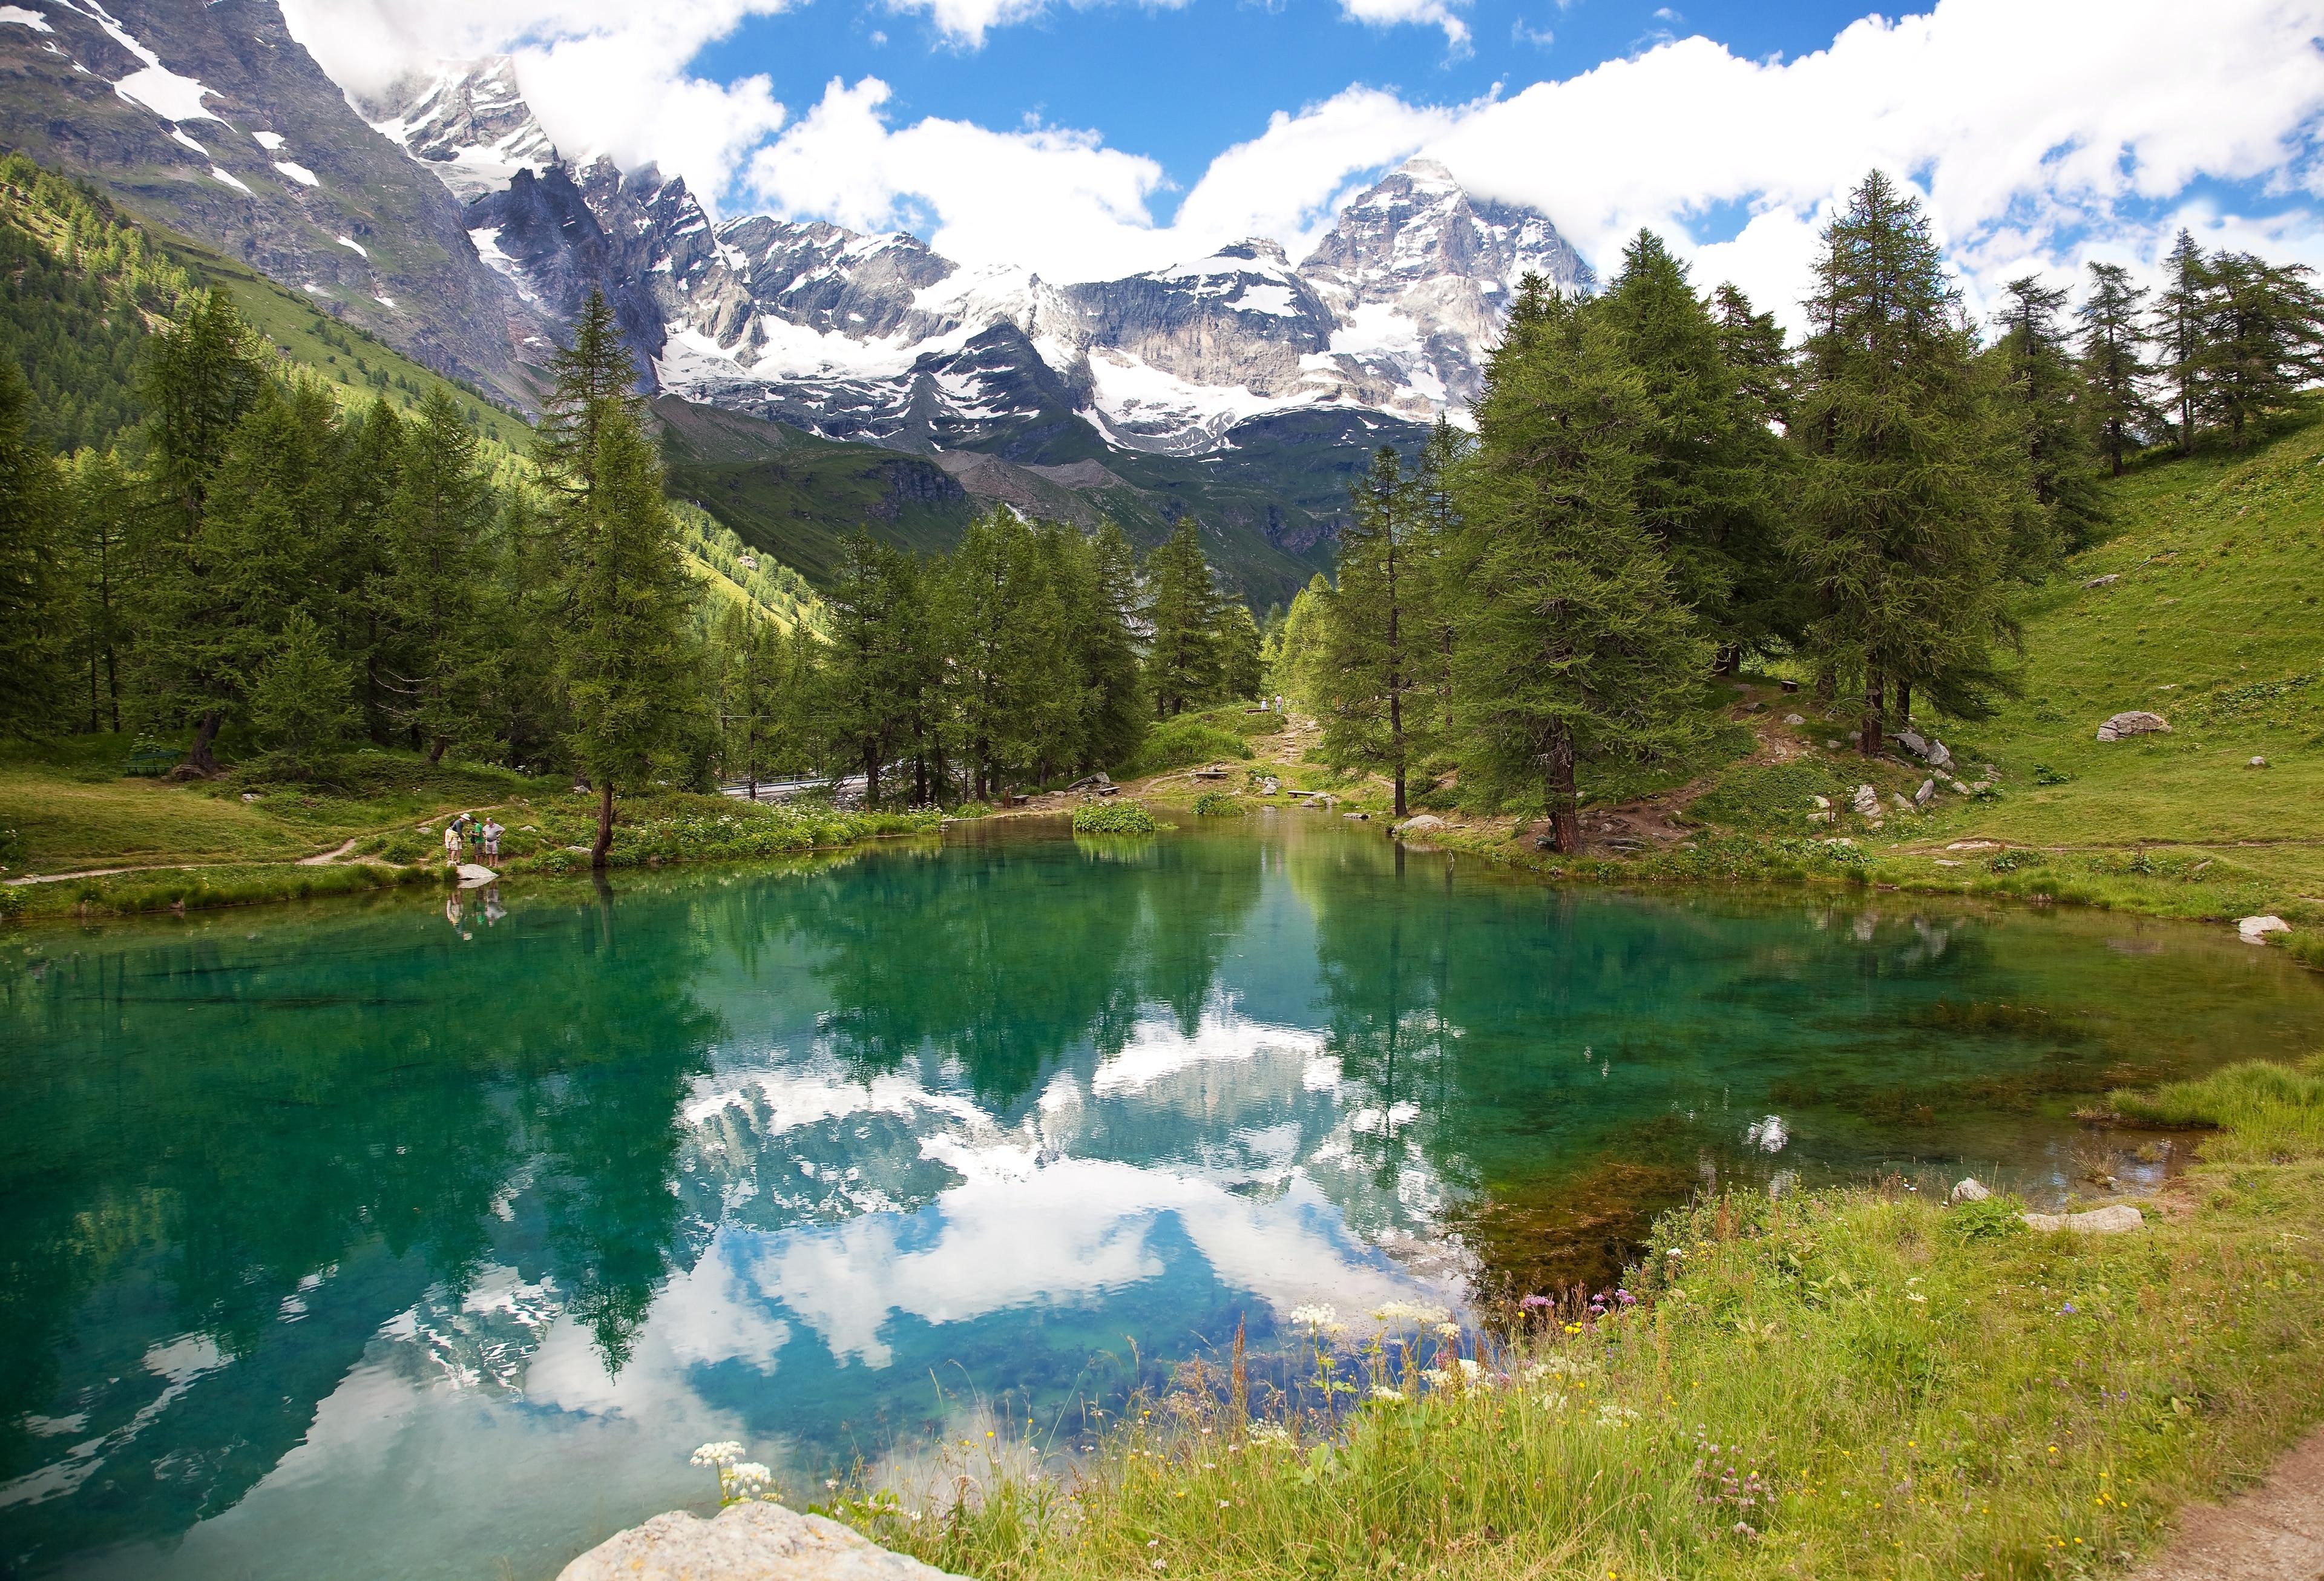 Skigebiet Breuil-Cervinia, Valtournenche, Aostatal, Italien